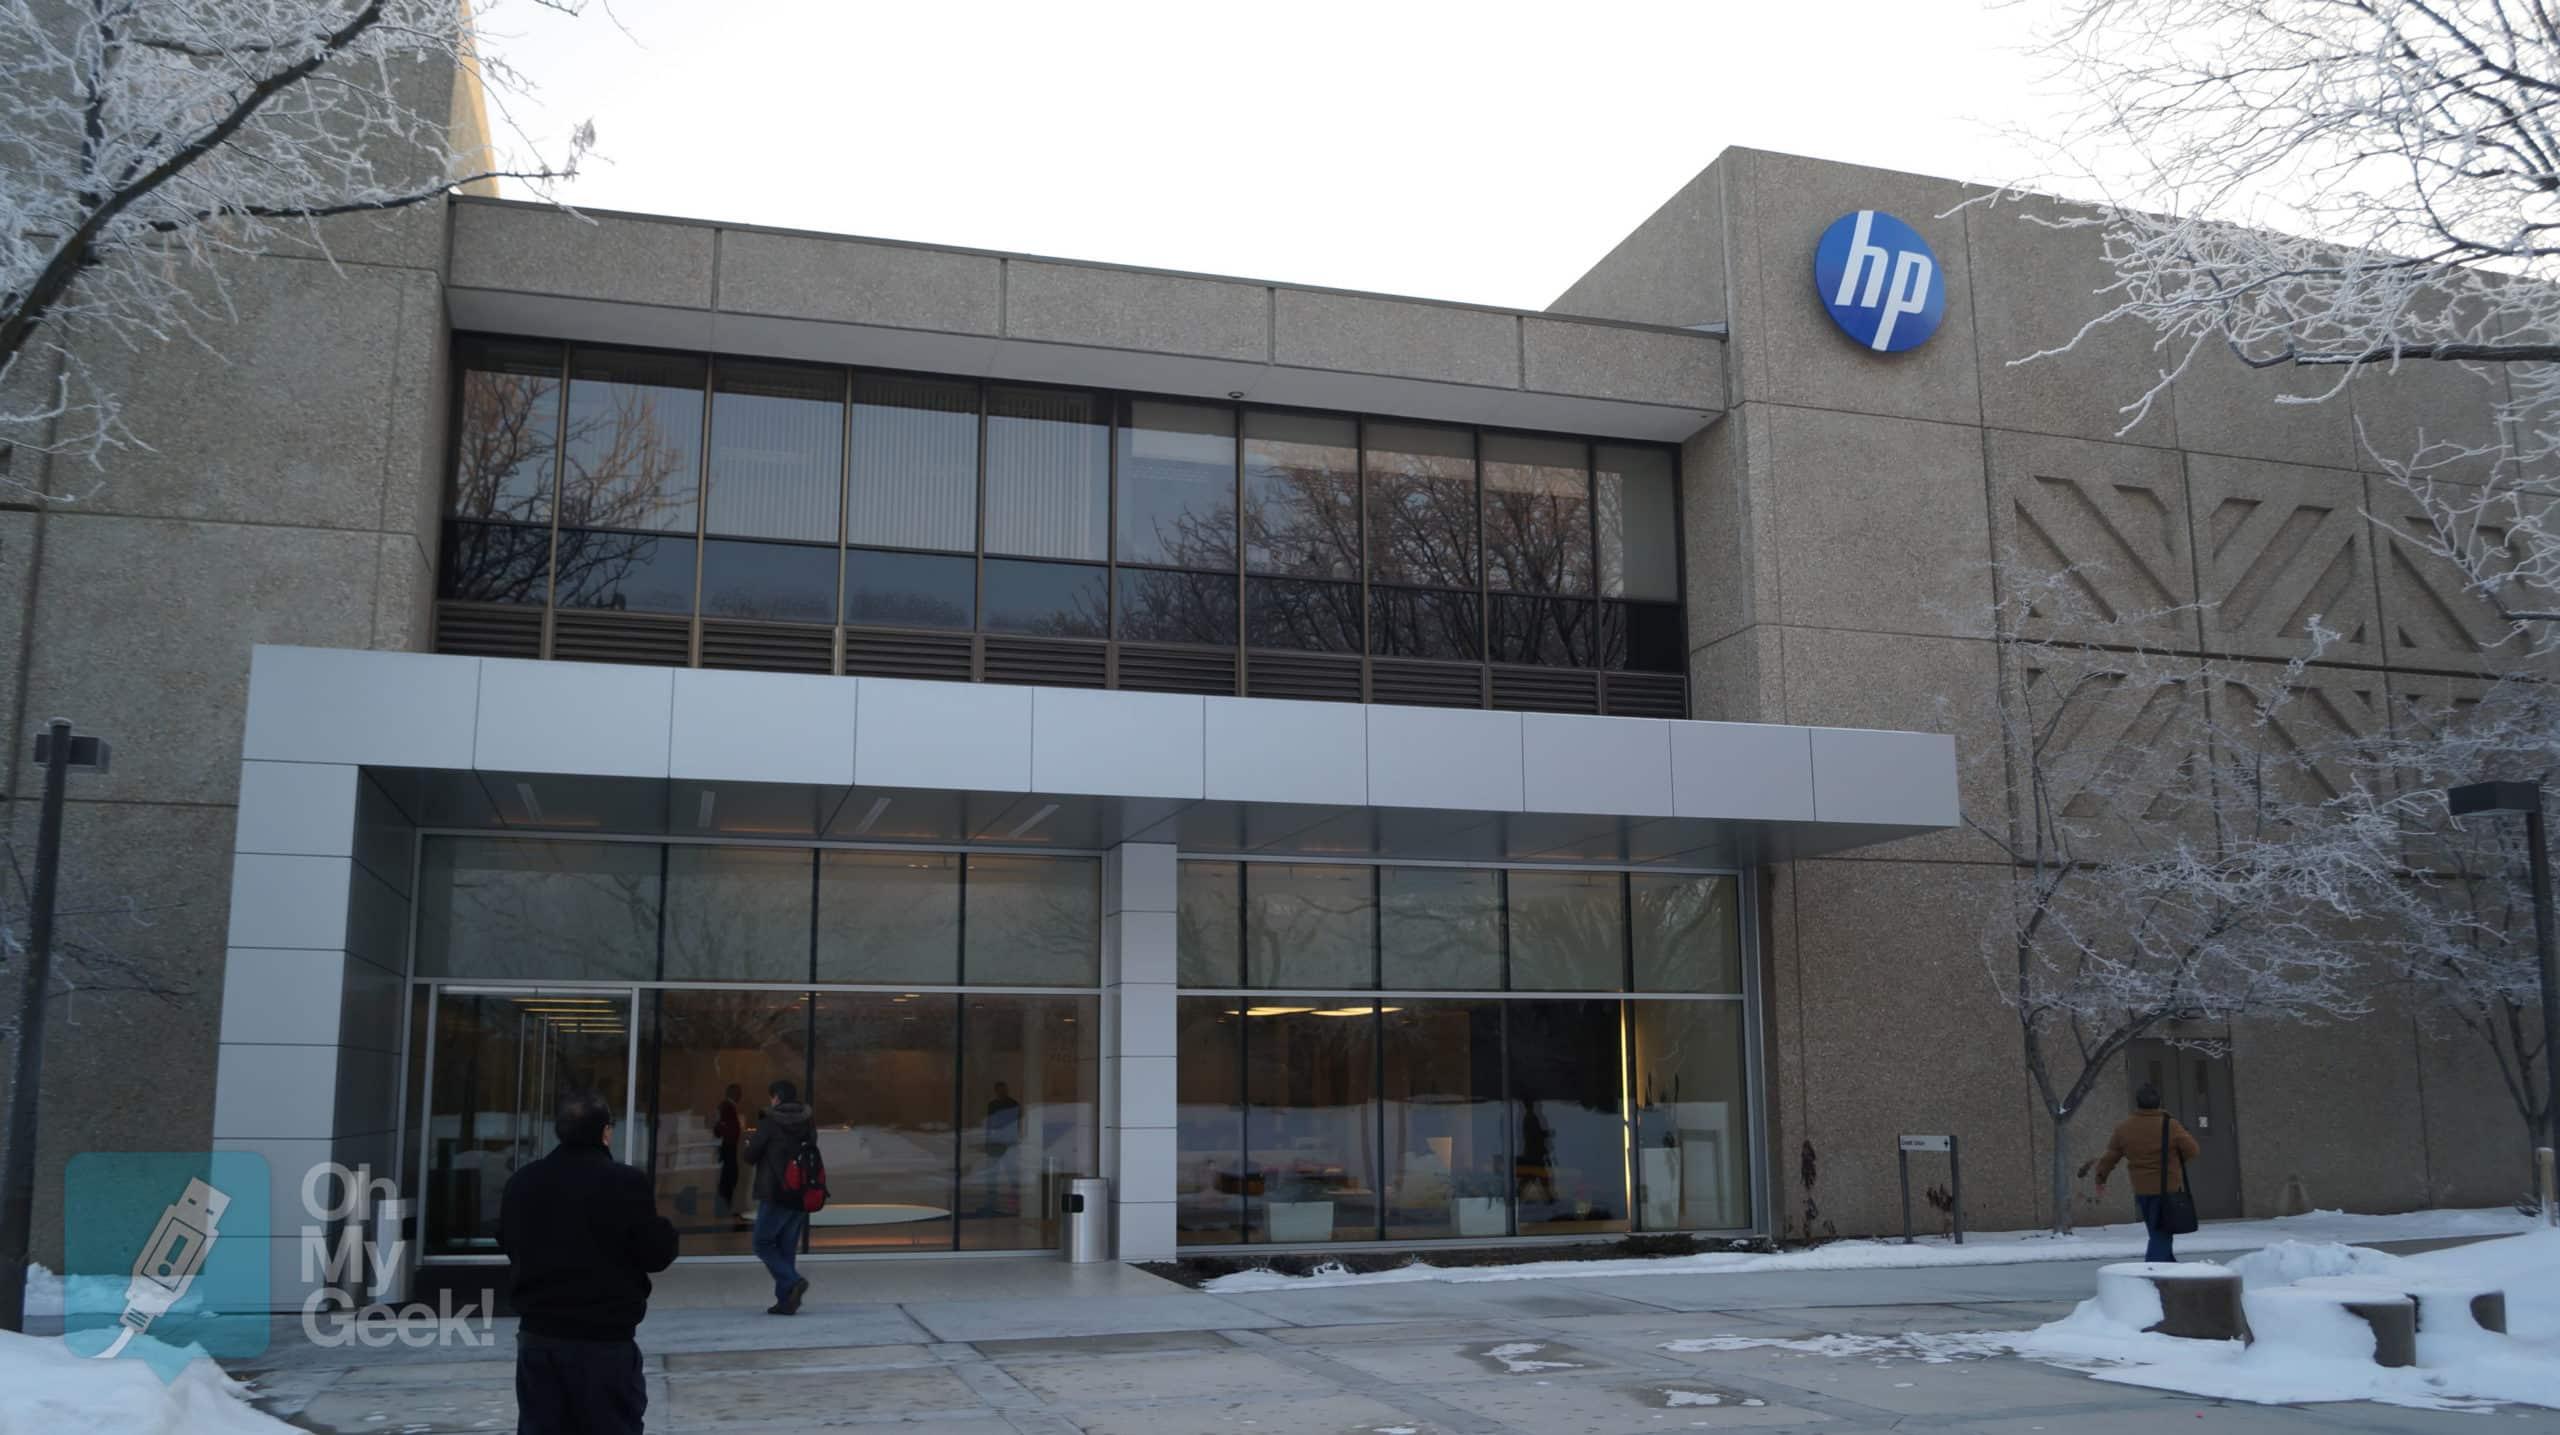 HP - Boise